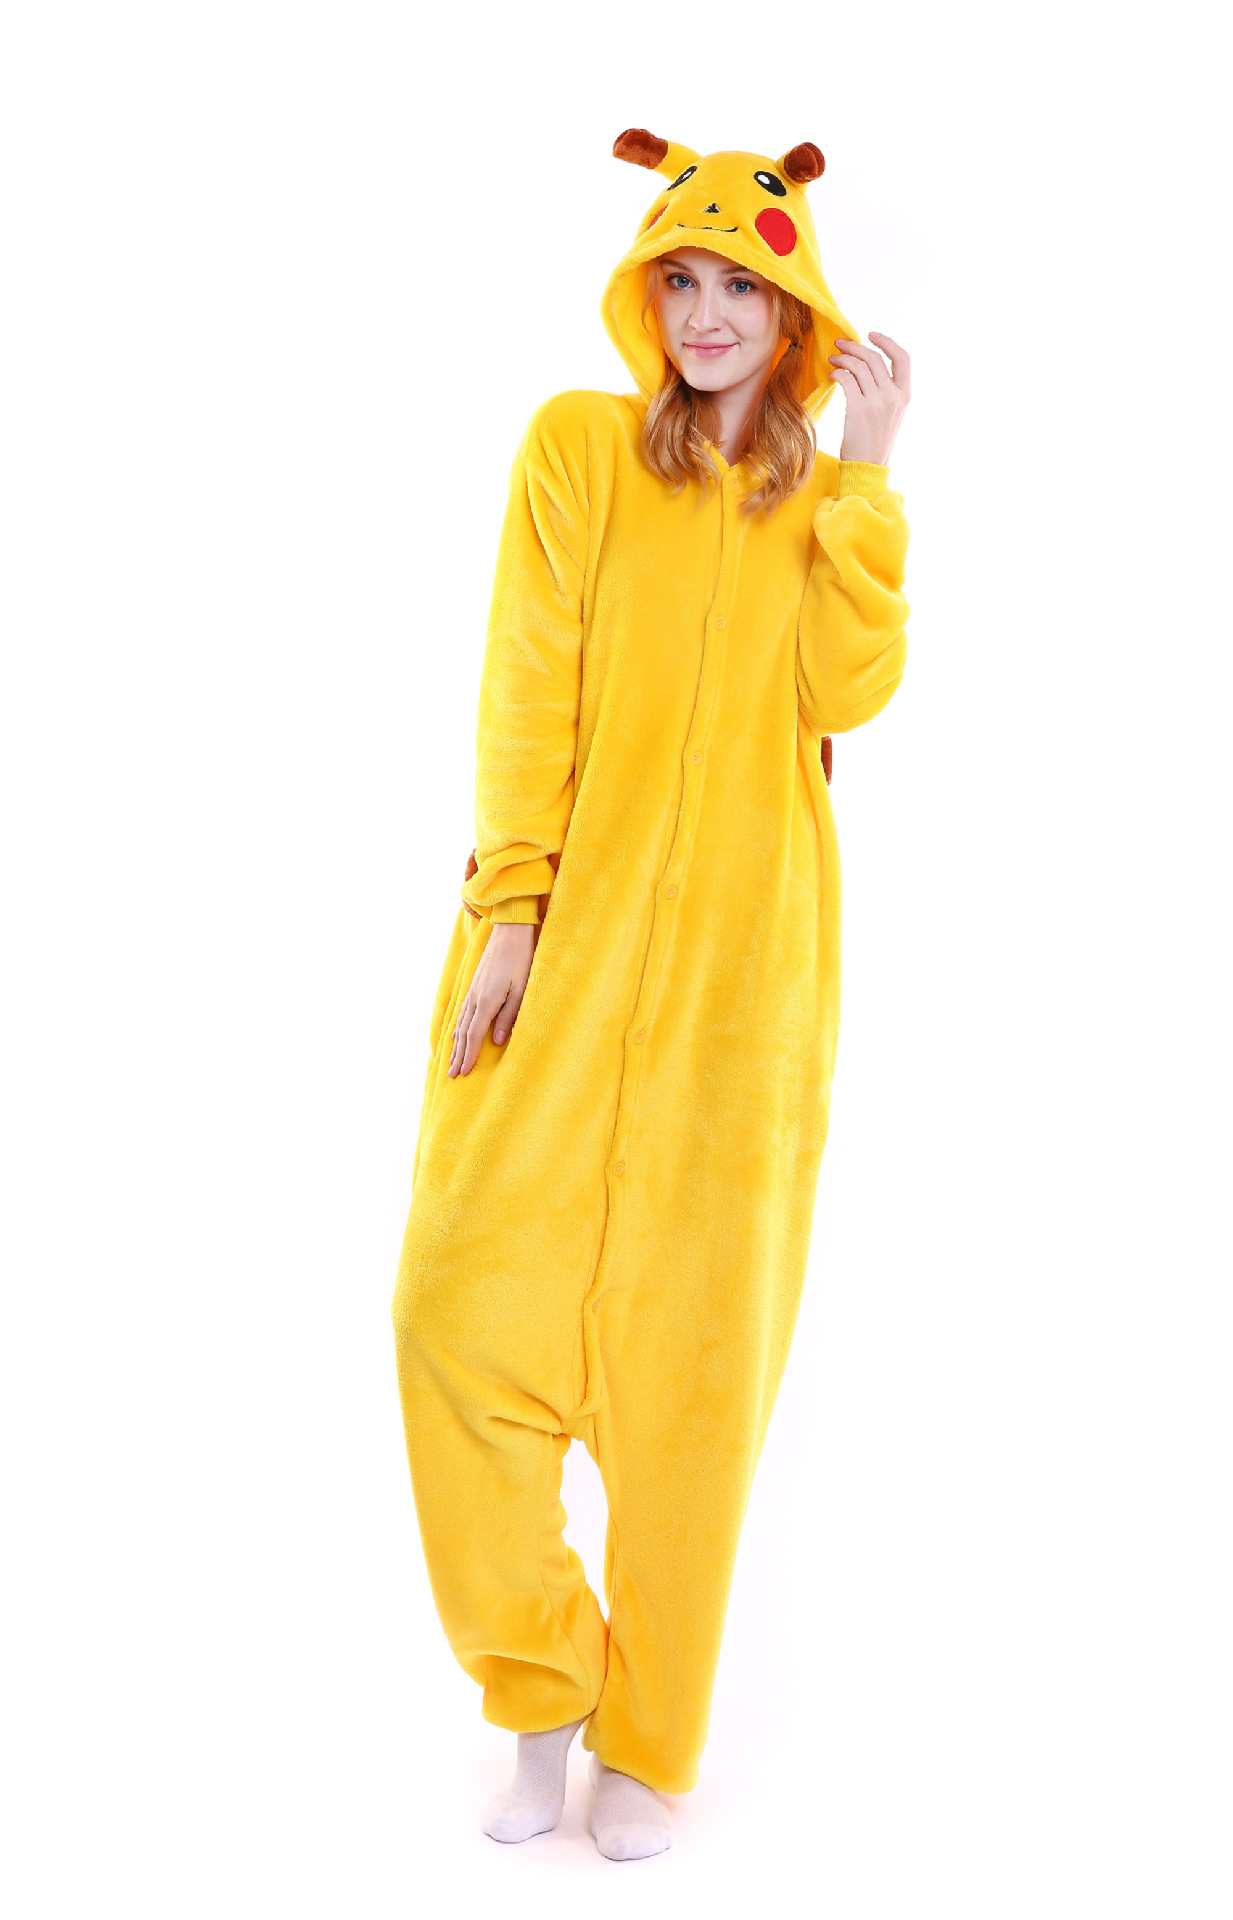 ZOGAA Jumpsuits for Women 2018 Homewear Cartoon Pikachu One Piece Pijama Hooded Sleepwear Plush Animal Pajamas Women Clothing